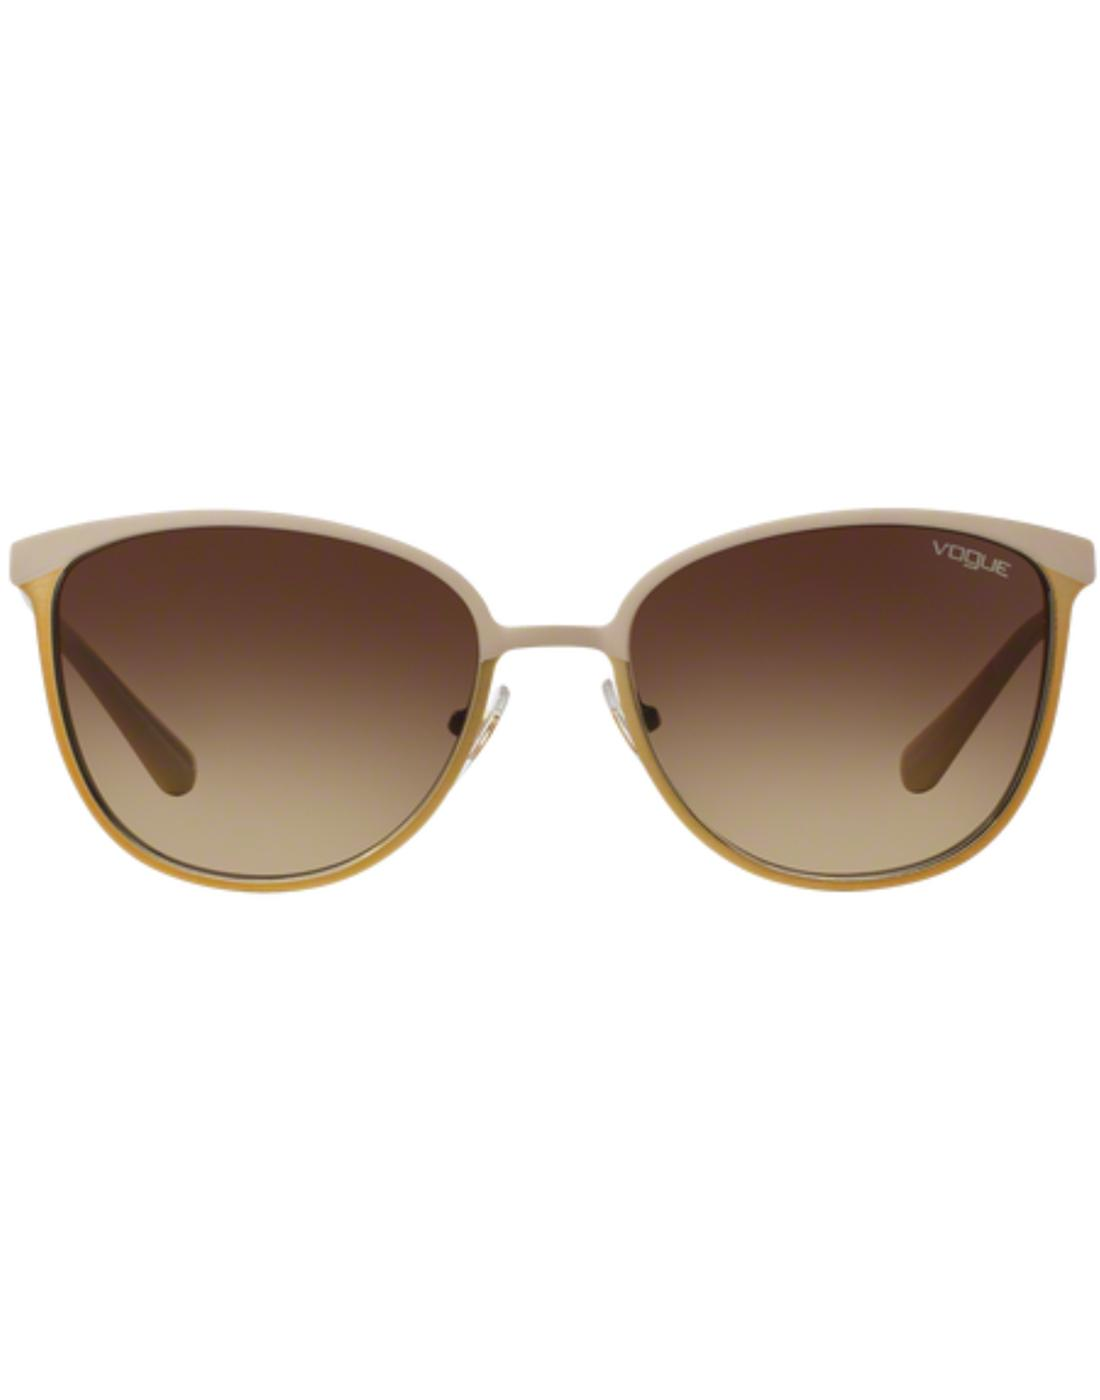 VOGUE Retro 60s Vintage Cats-Eye Large Sunglasses